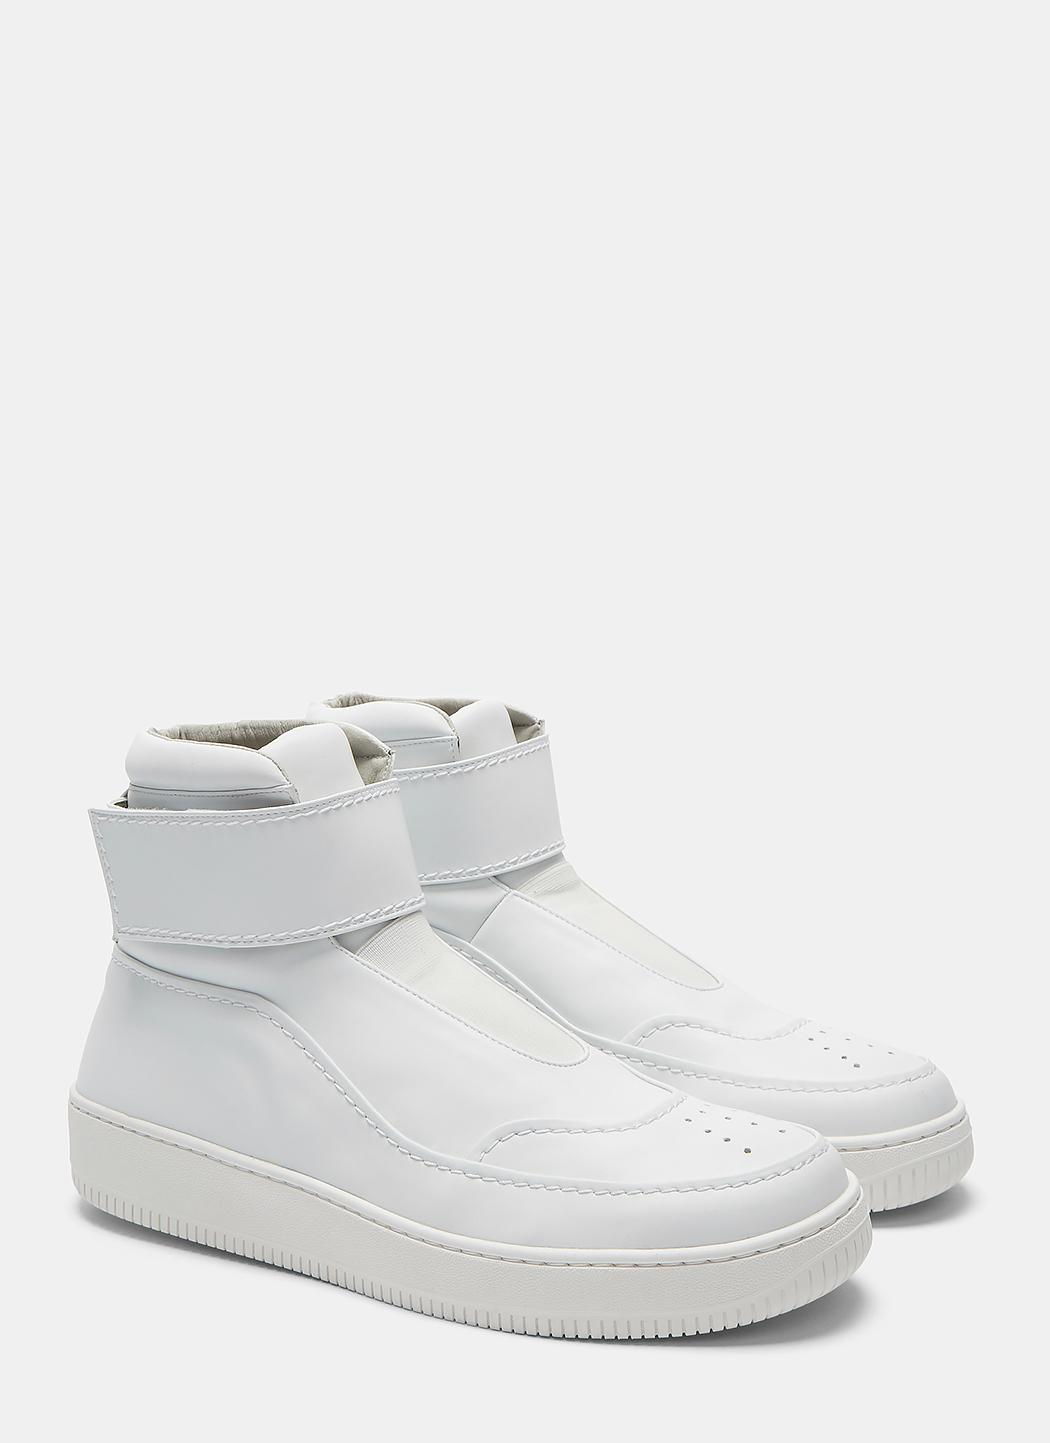 Mens White Coach Shoes